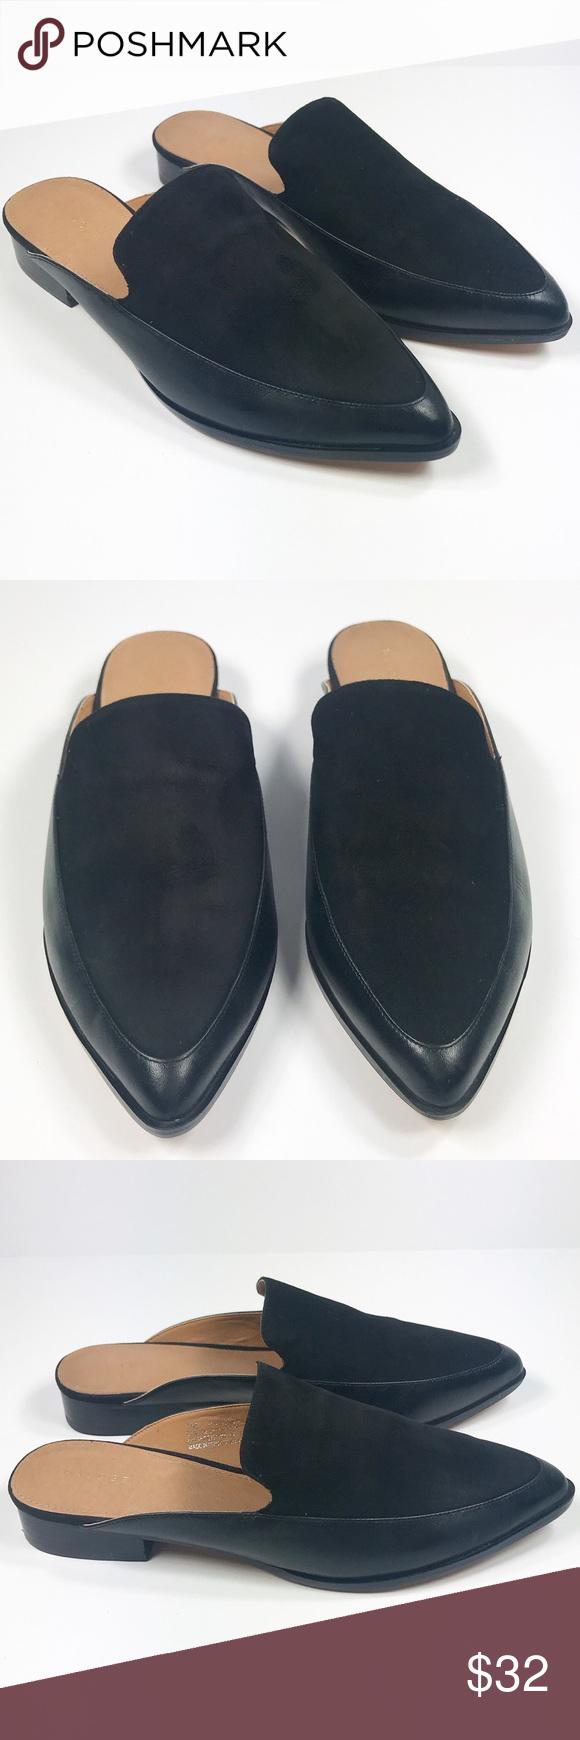 c738de006a1 Halogen Corbin Black Suede Leather Mules Size 7 Halogen Corbin Mule in Black  Leather Suede Women